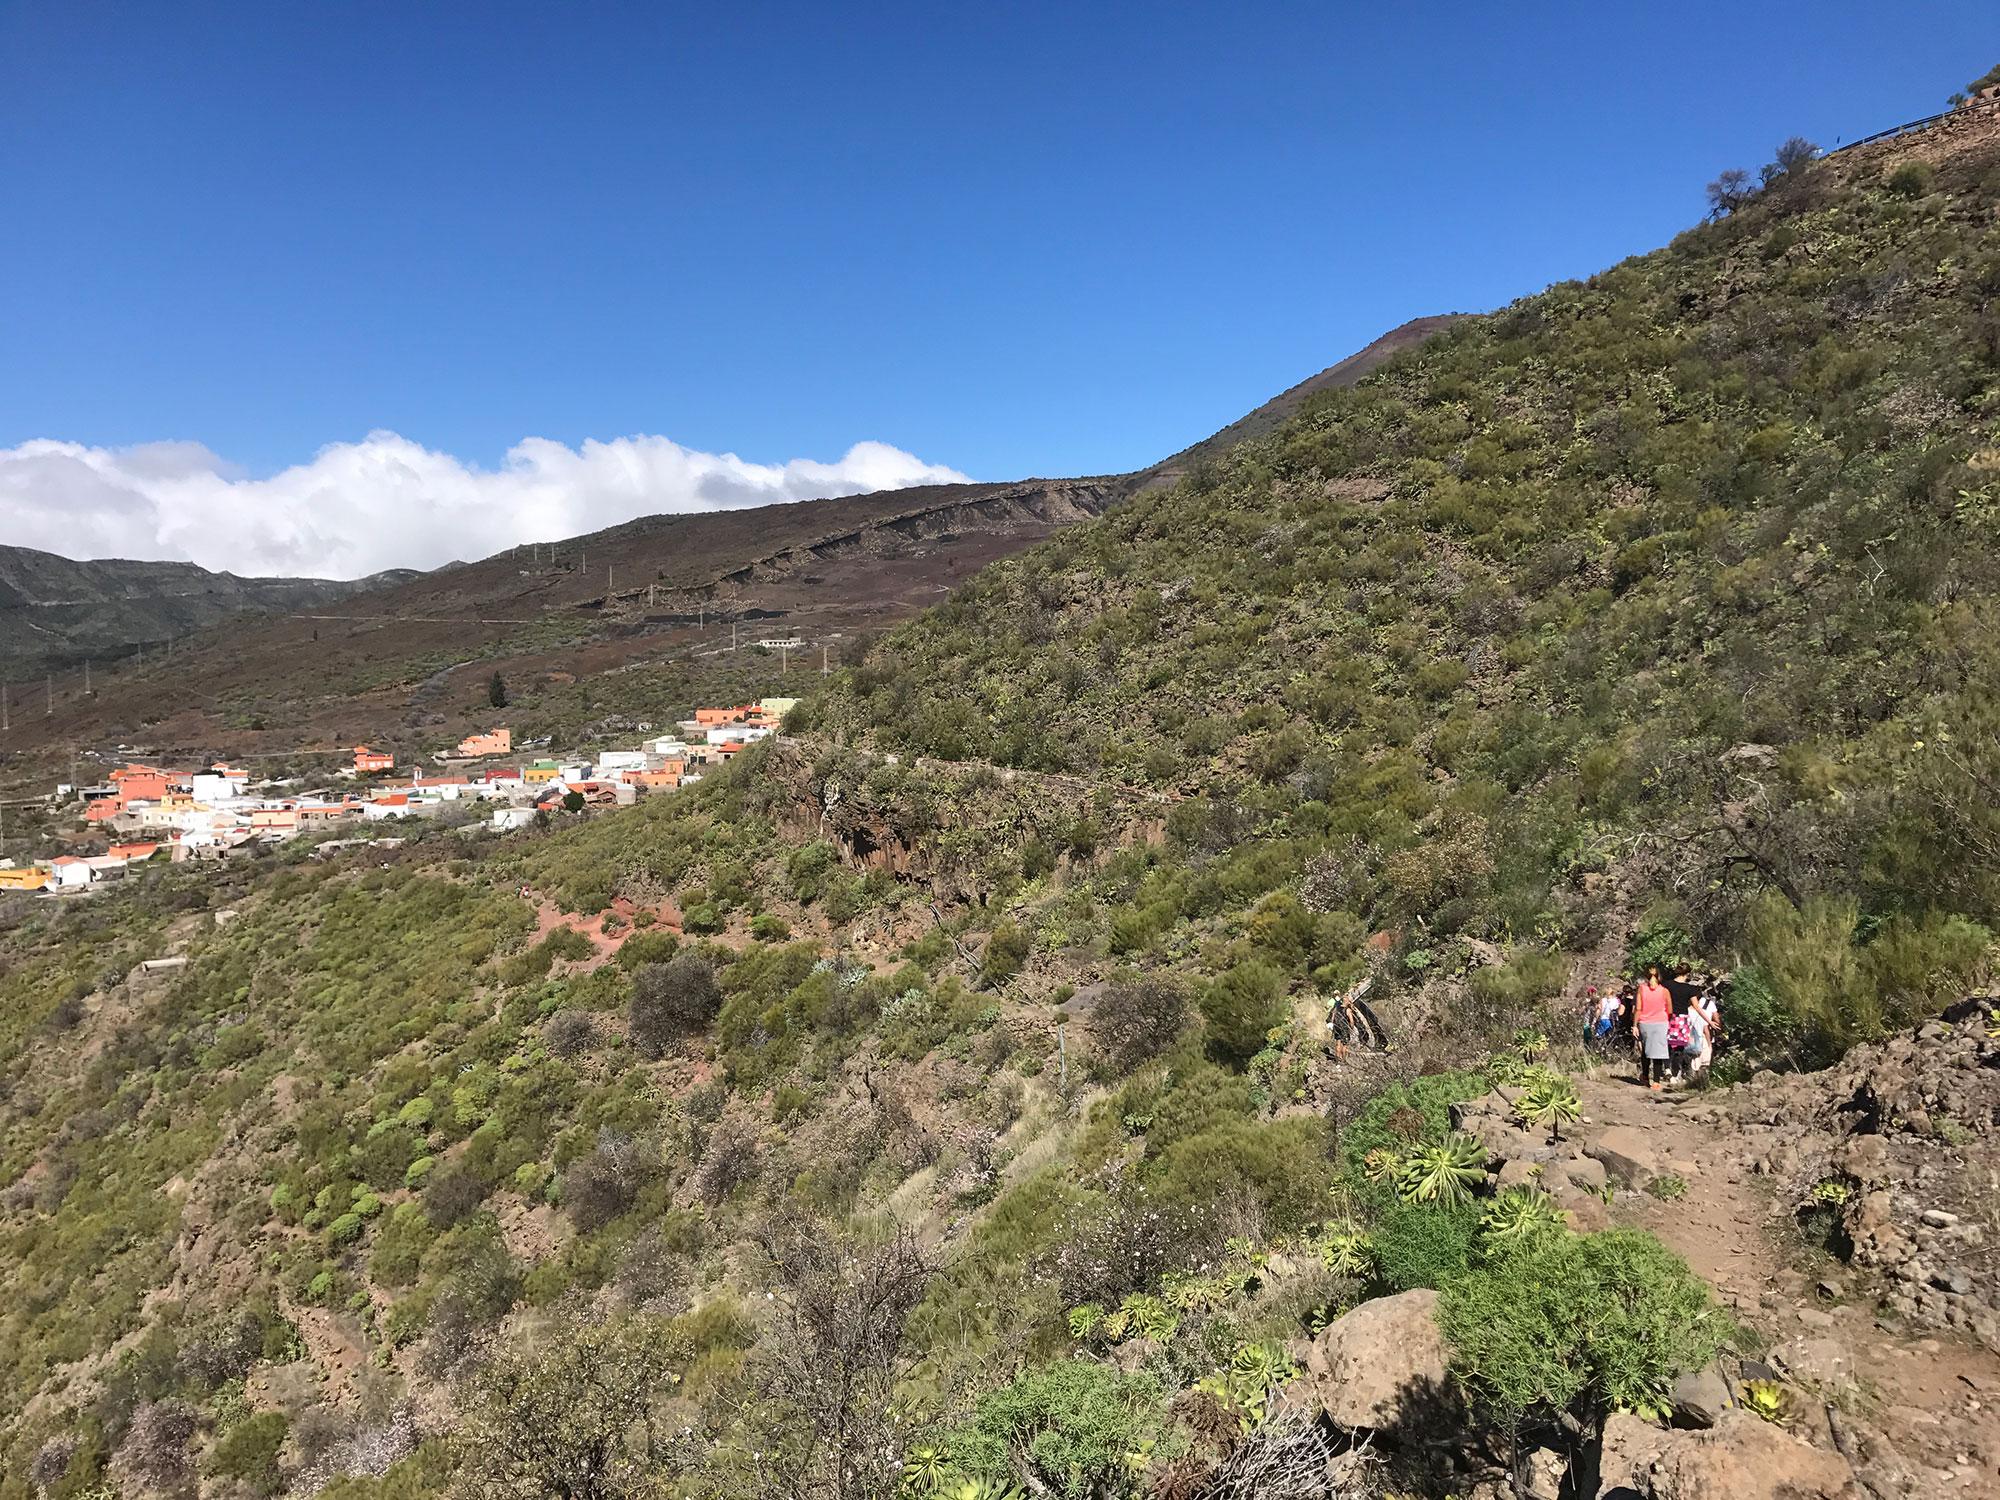 almendros_en_flor_Tenerife2.jpg